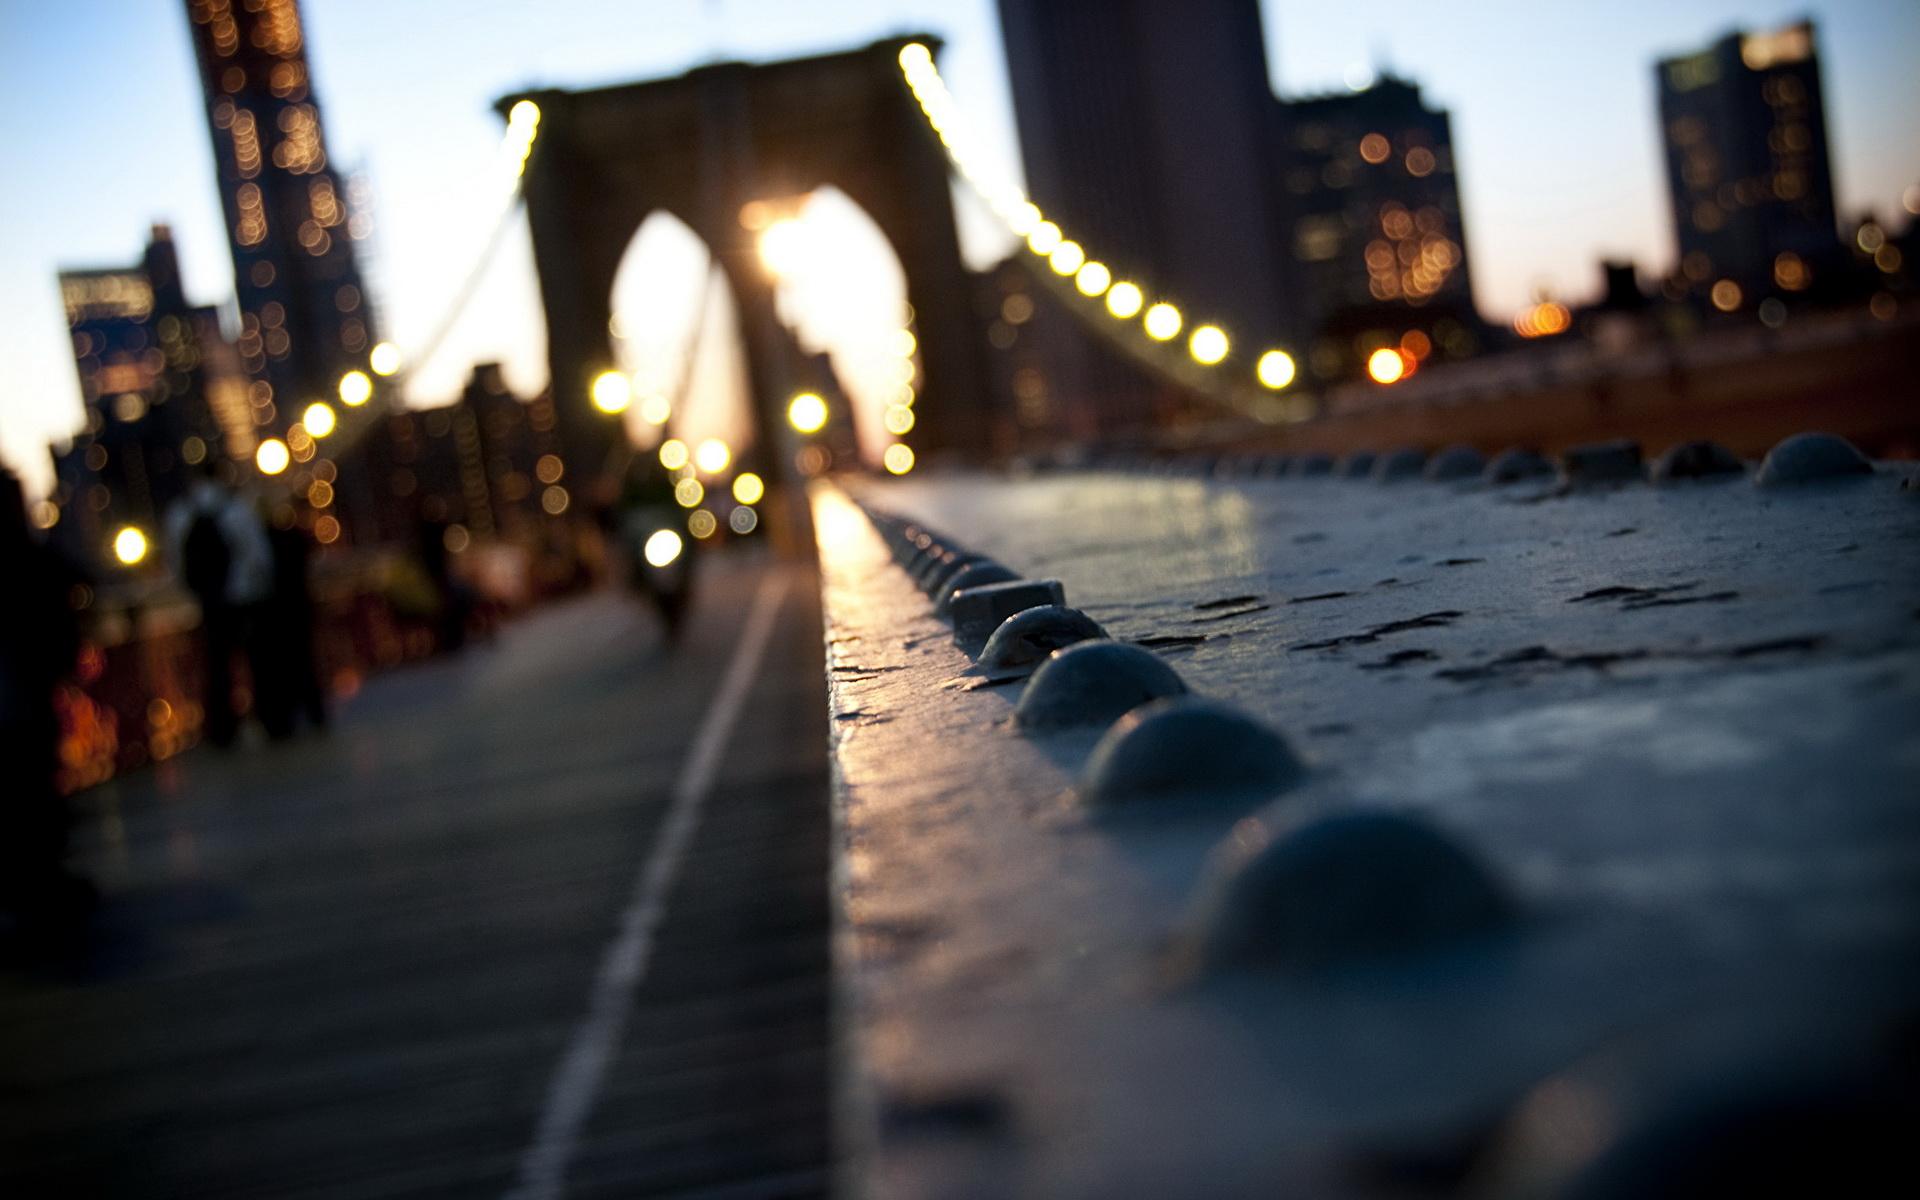 bridge wallpaper collection 28 - photo #33